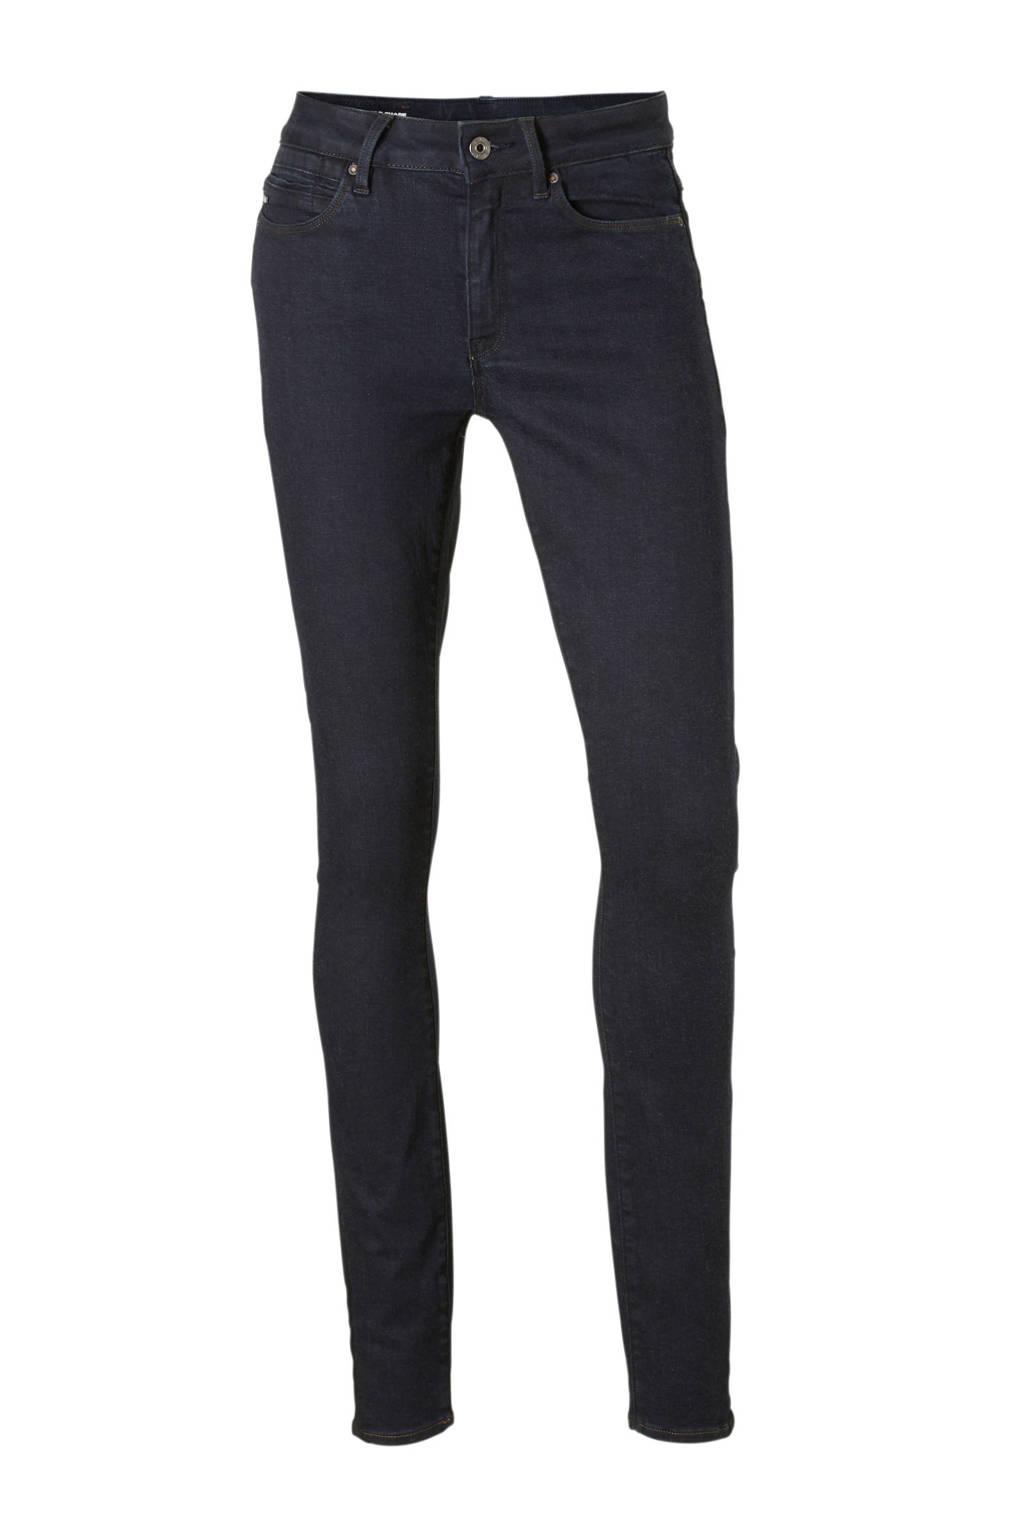 G-Star RAW high waist skinny jeans donkerblauw, Donkerblauw